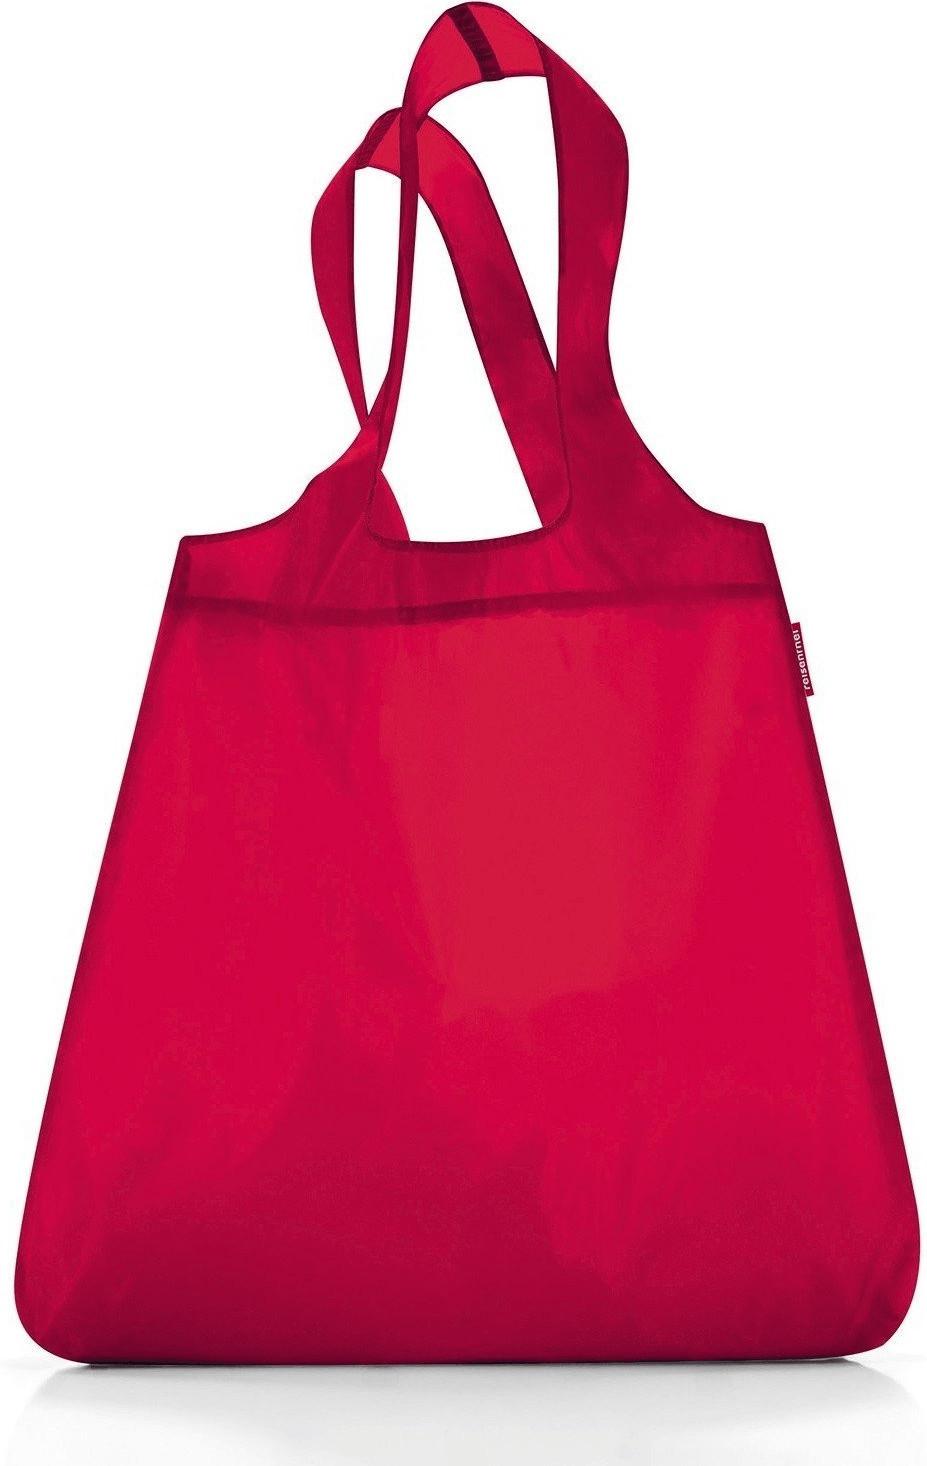 Reisenthel Mini Maxi Shopper red